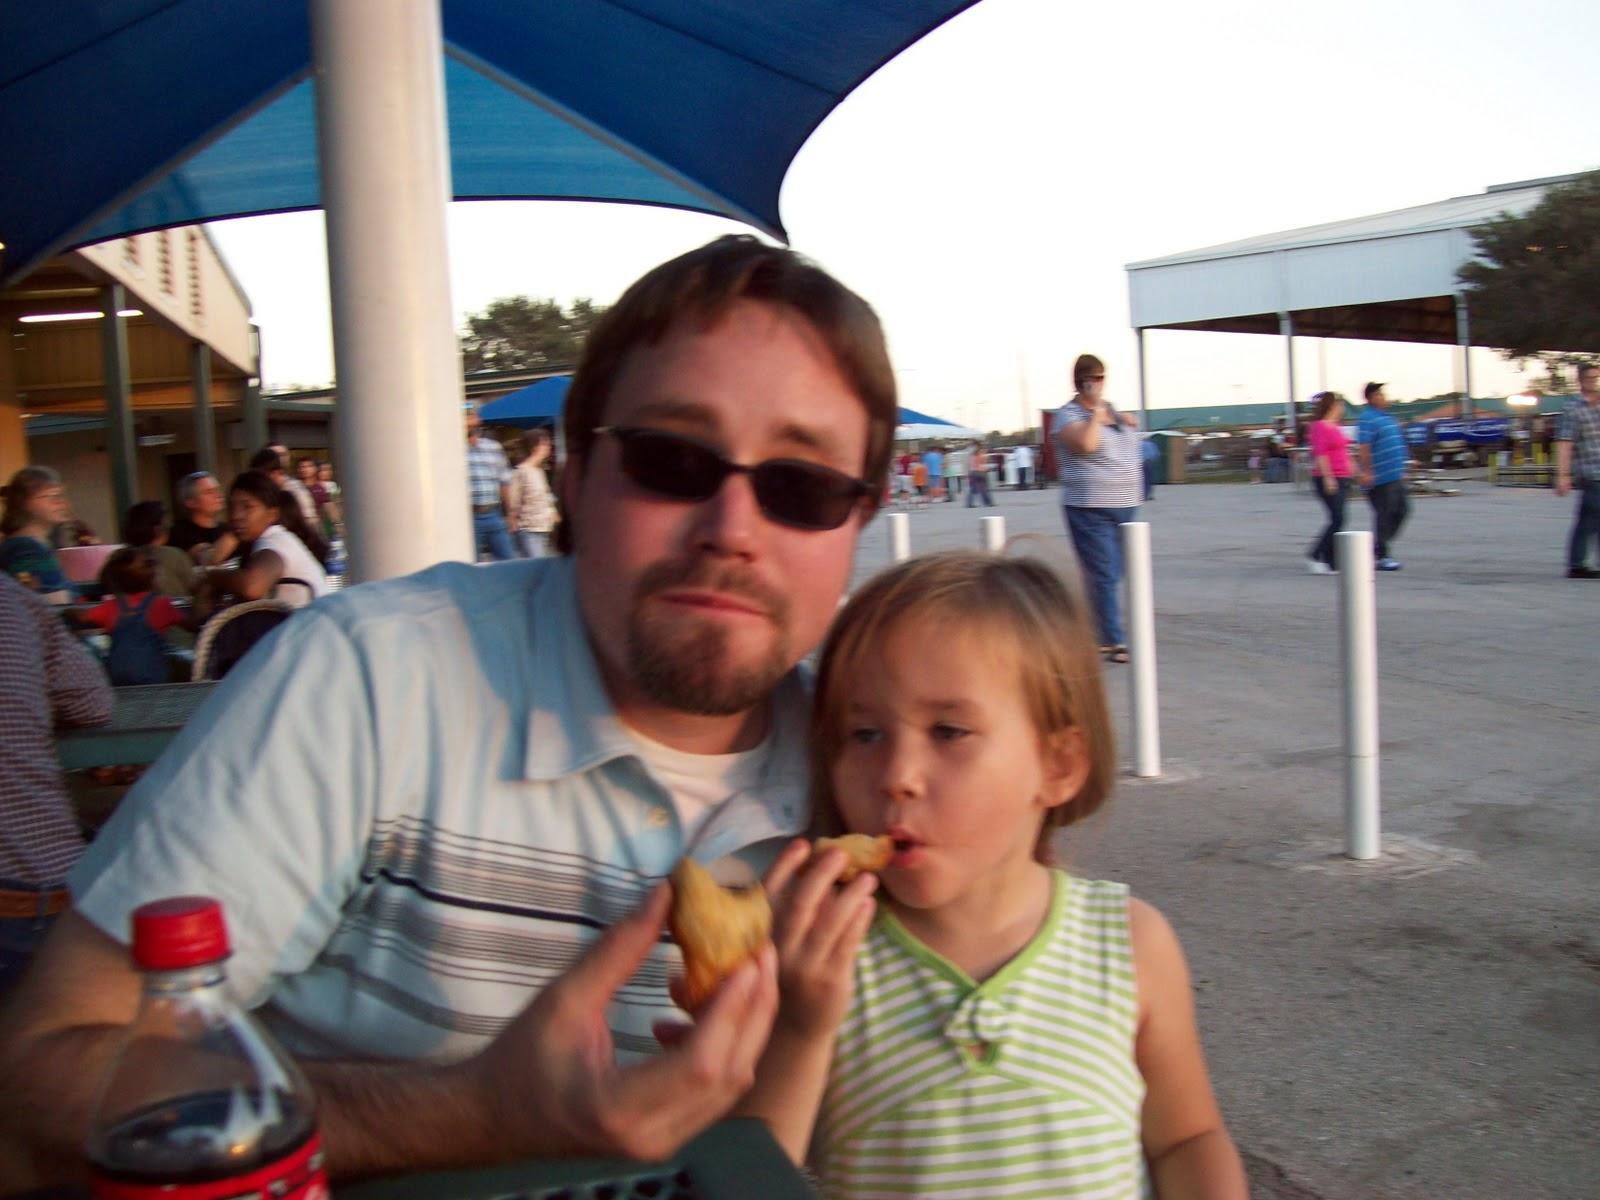 Fort Bend County Fair 2008 - 101_0433.JPG